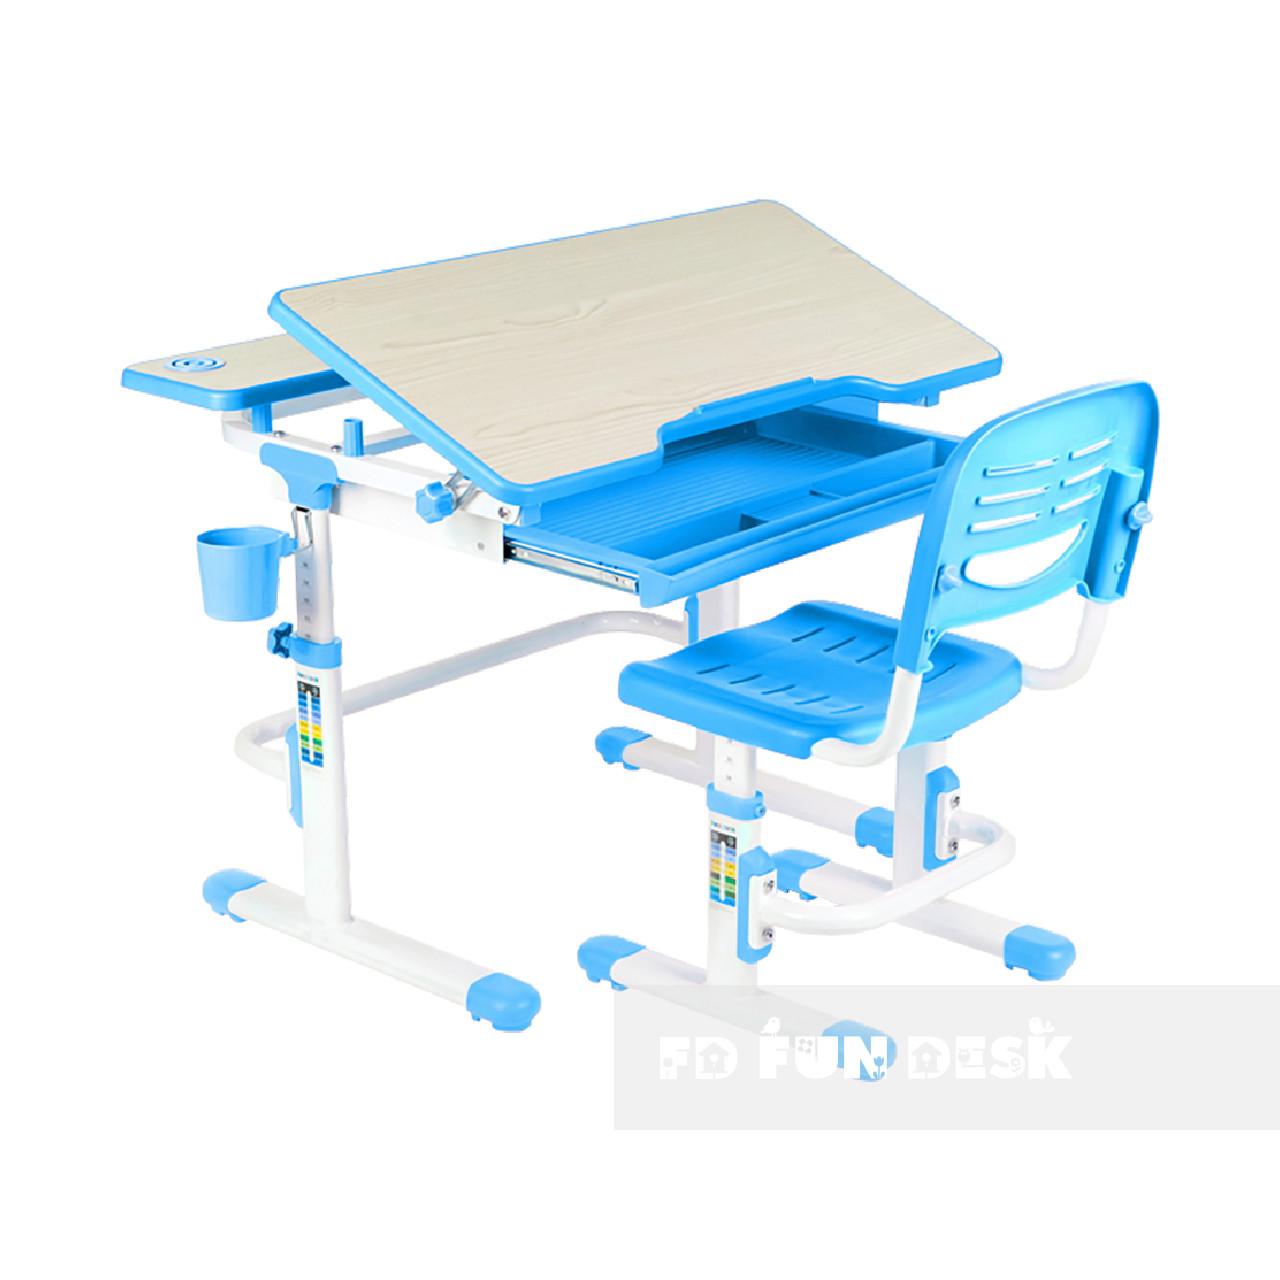 Зростаюча парта + стілець для школяра Fundesk Lavoro Blue + настільна світлодіодна лампа FunDesk L1